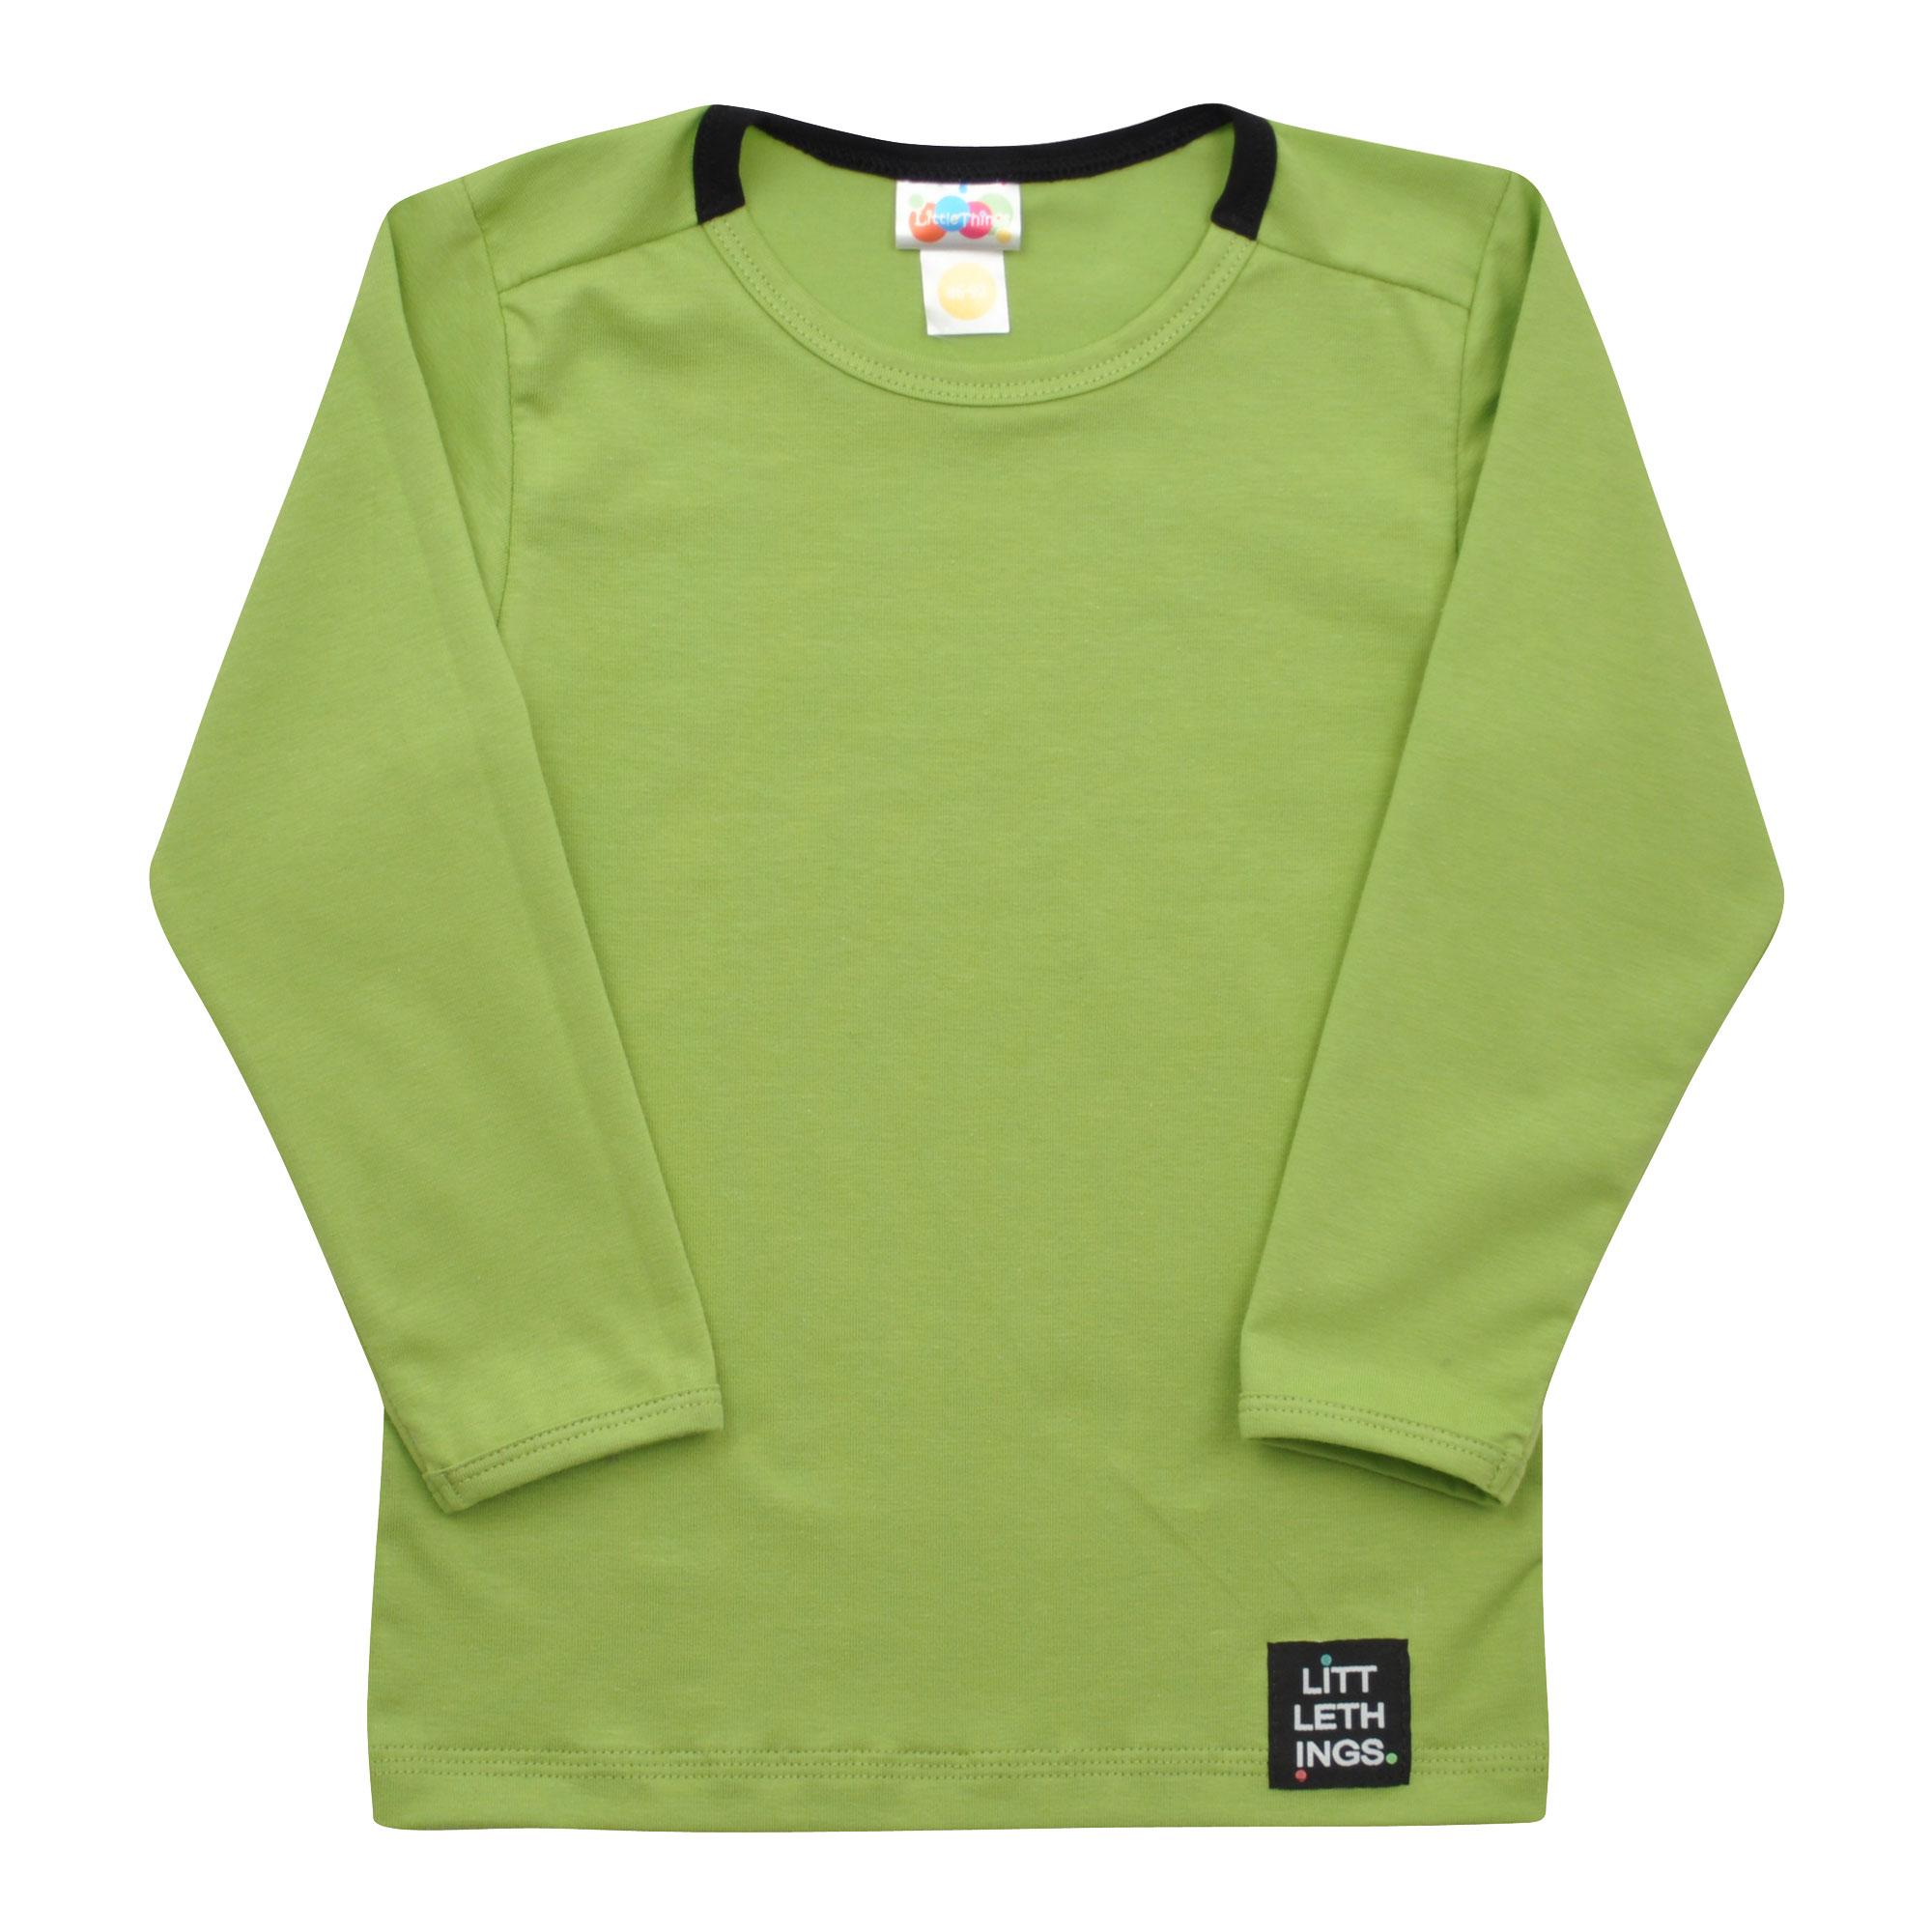 de87c58603e zelené tričko s dlouhým rukávem